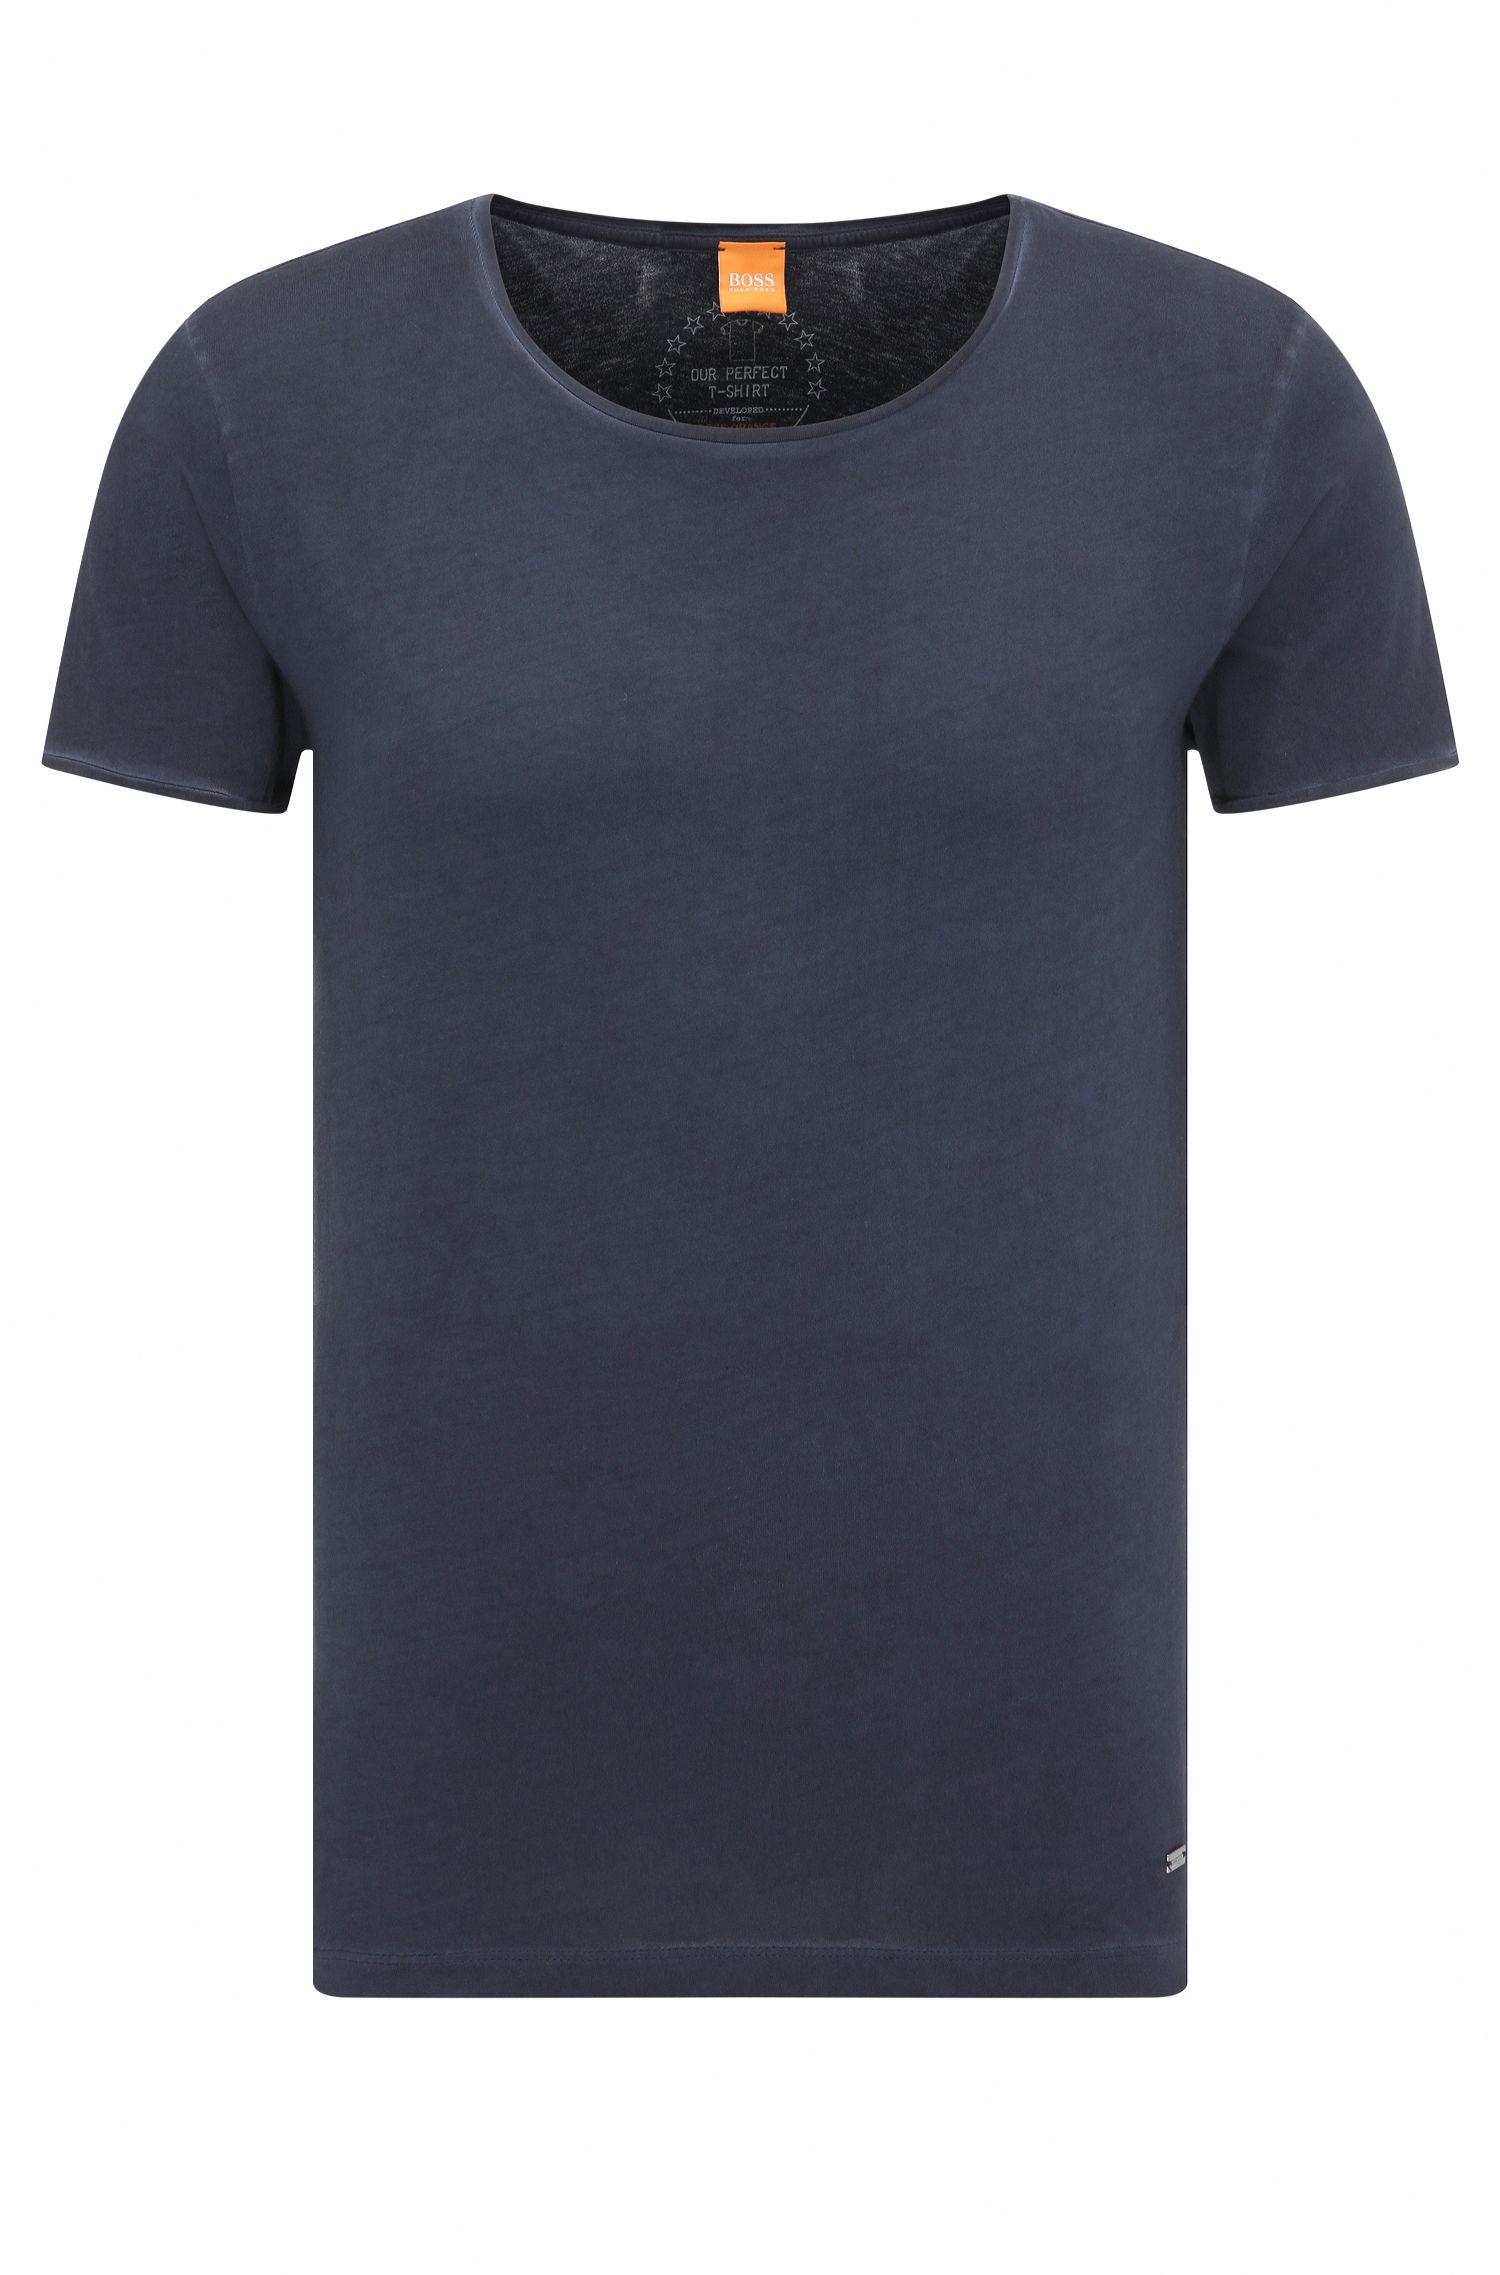 Unifarbenes Slim-Fit T-Shirt aus Baumwolle: ´Touring`